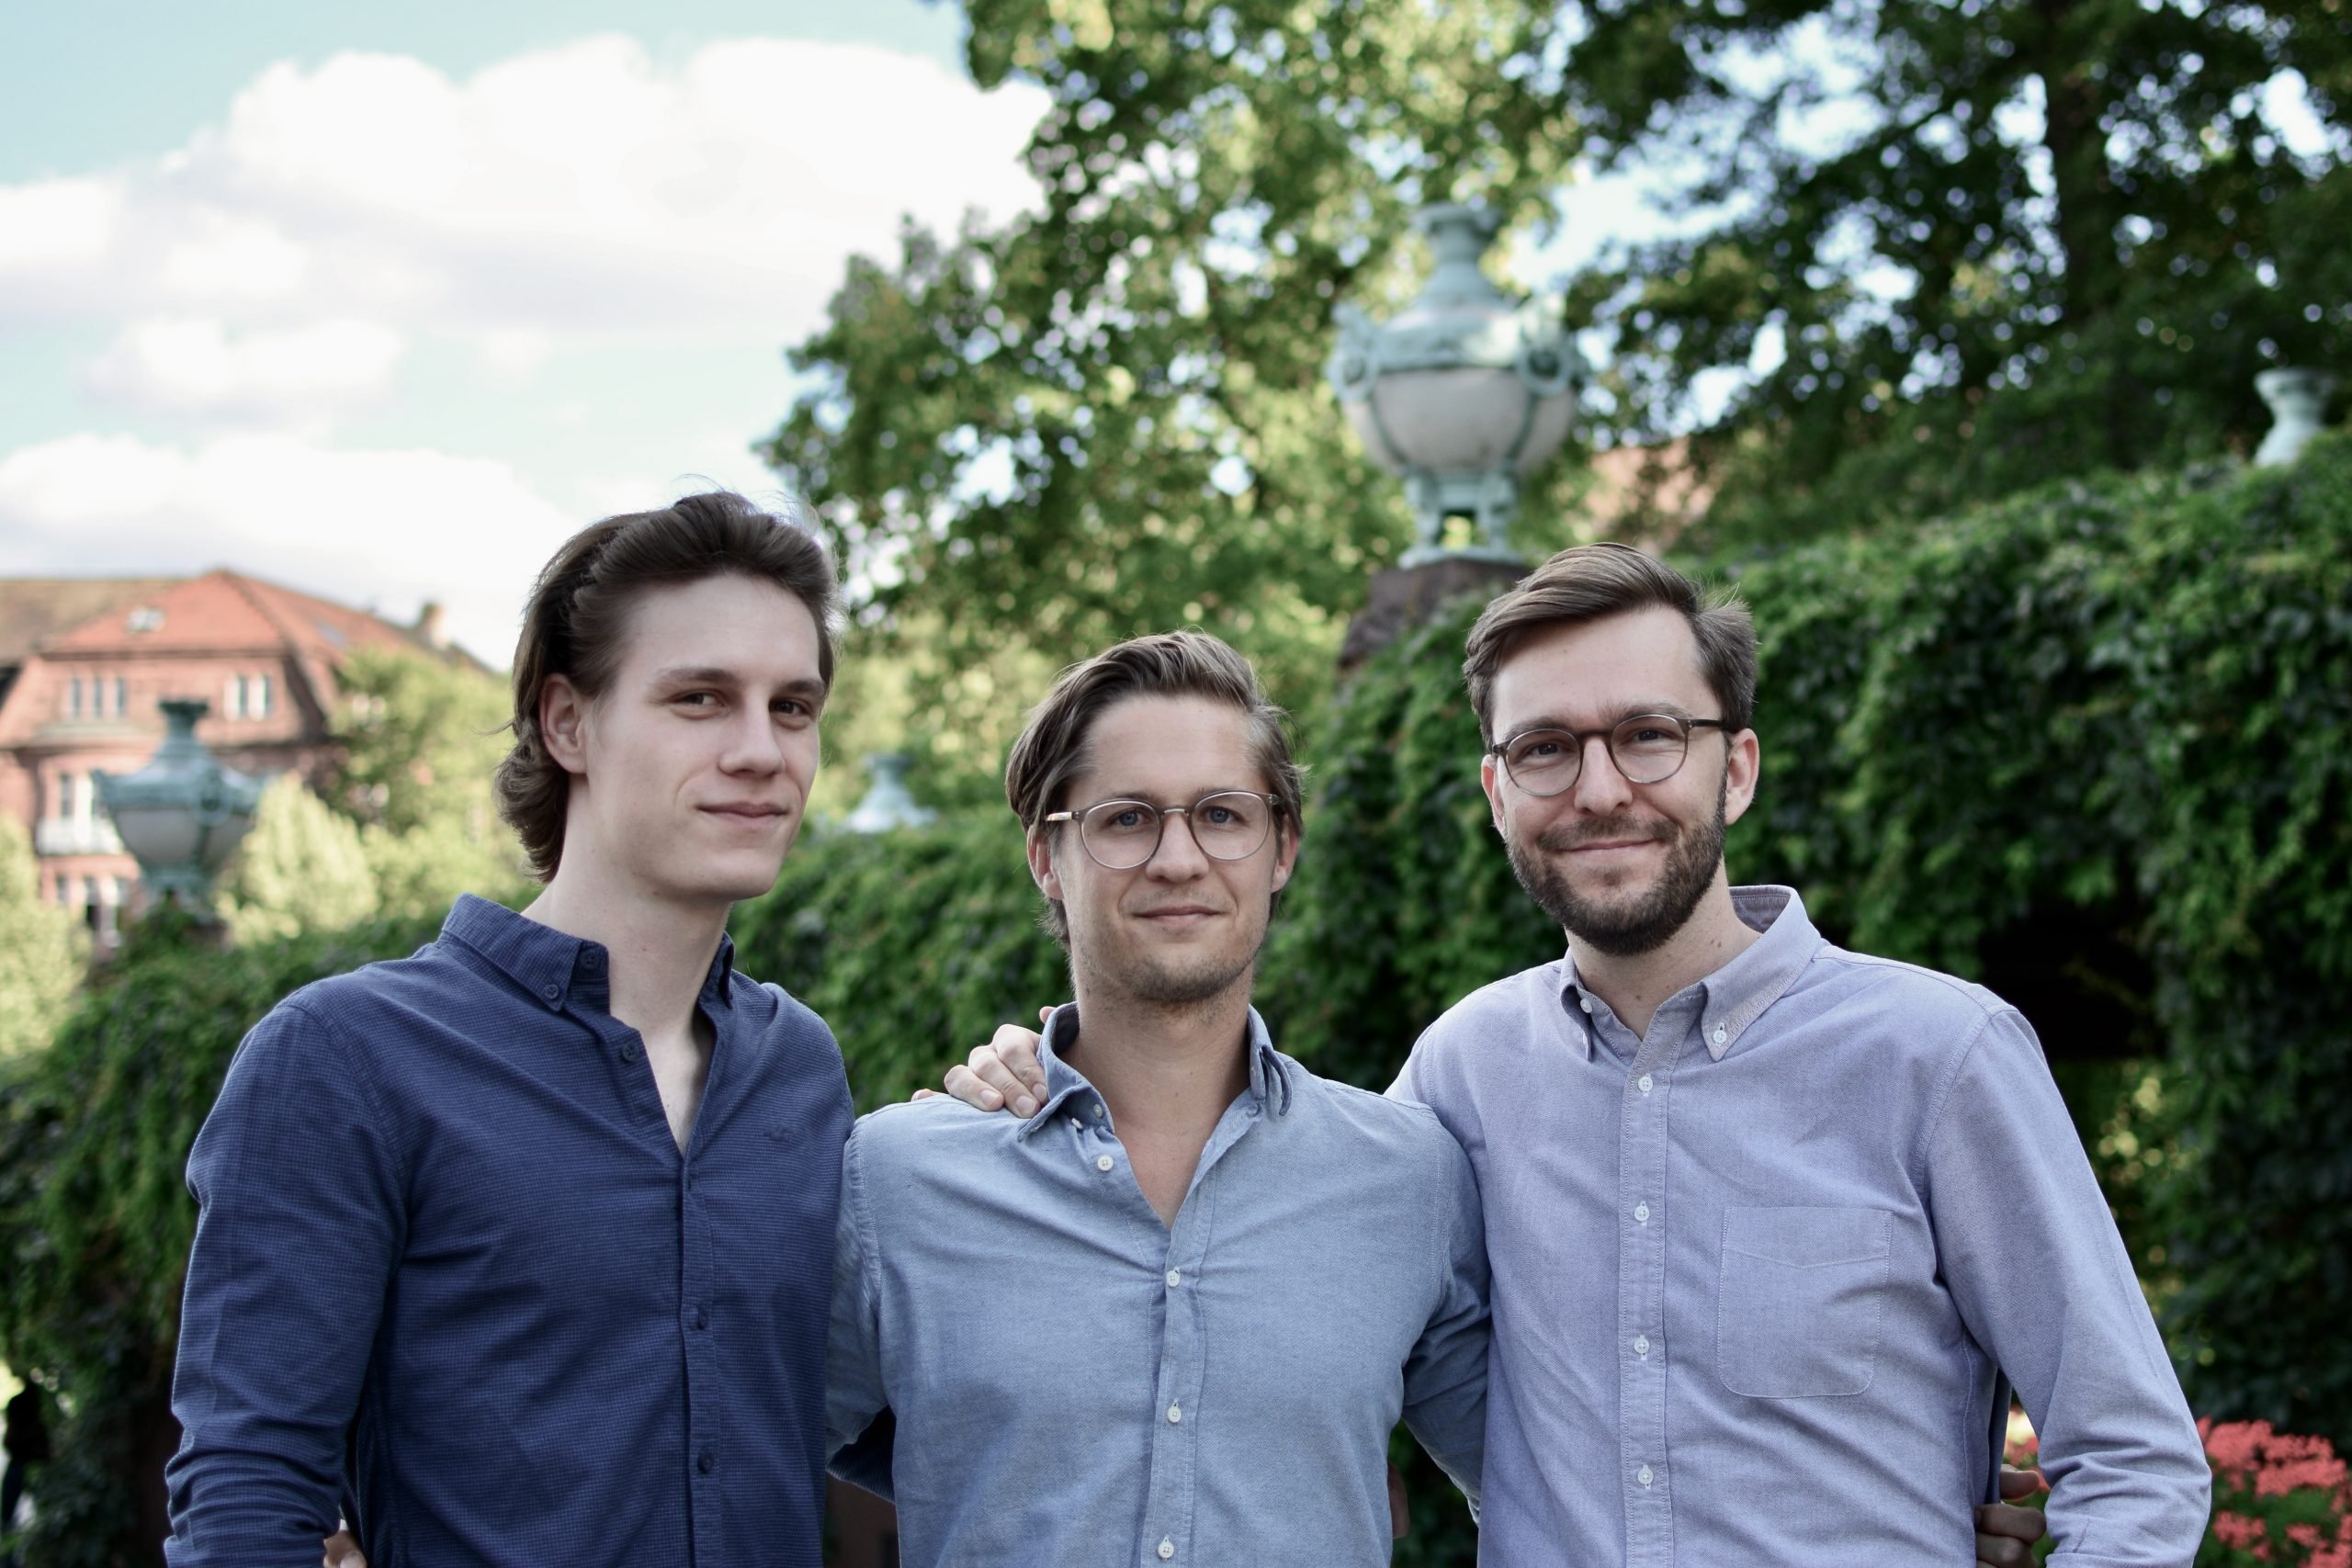 Gründer MARA Solutions GmbH: Ingo Lange, Dr. Tobias Roelen-Blasberg, Dr. Maximilian Lüders